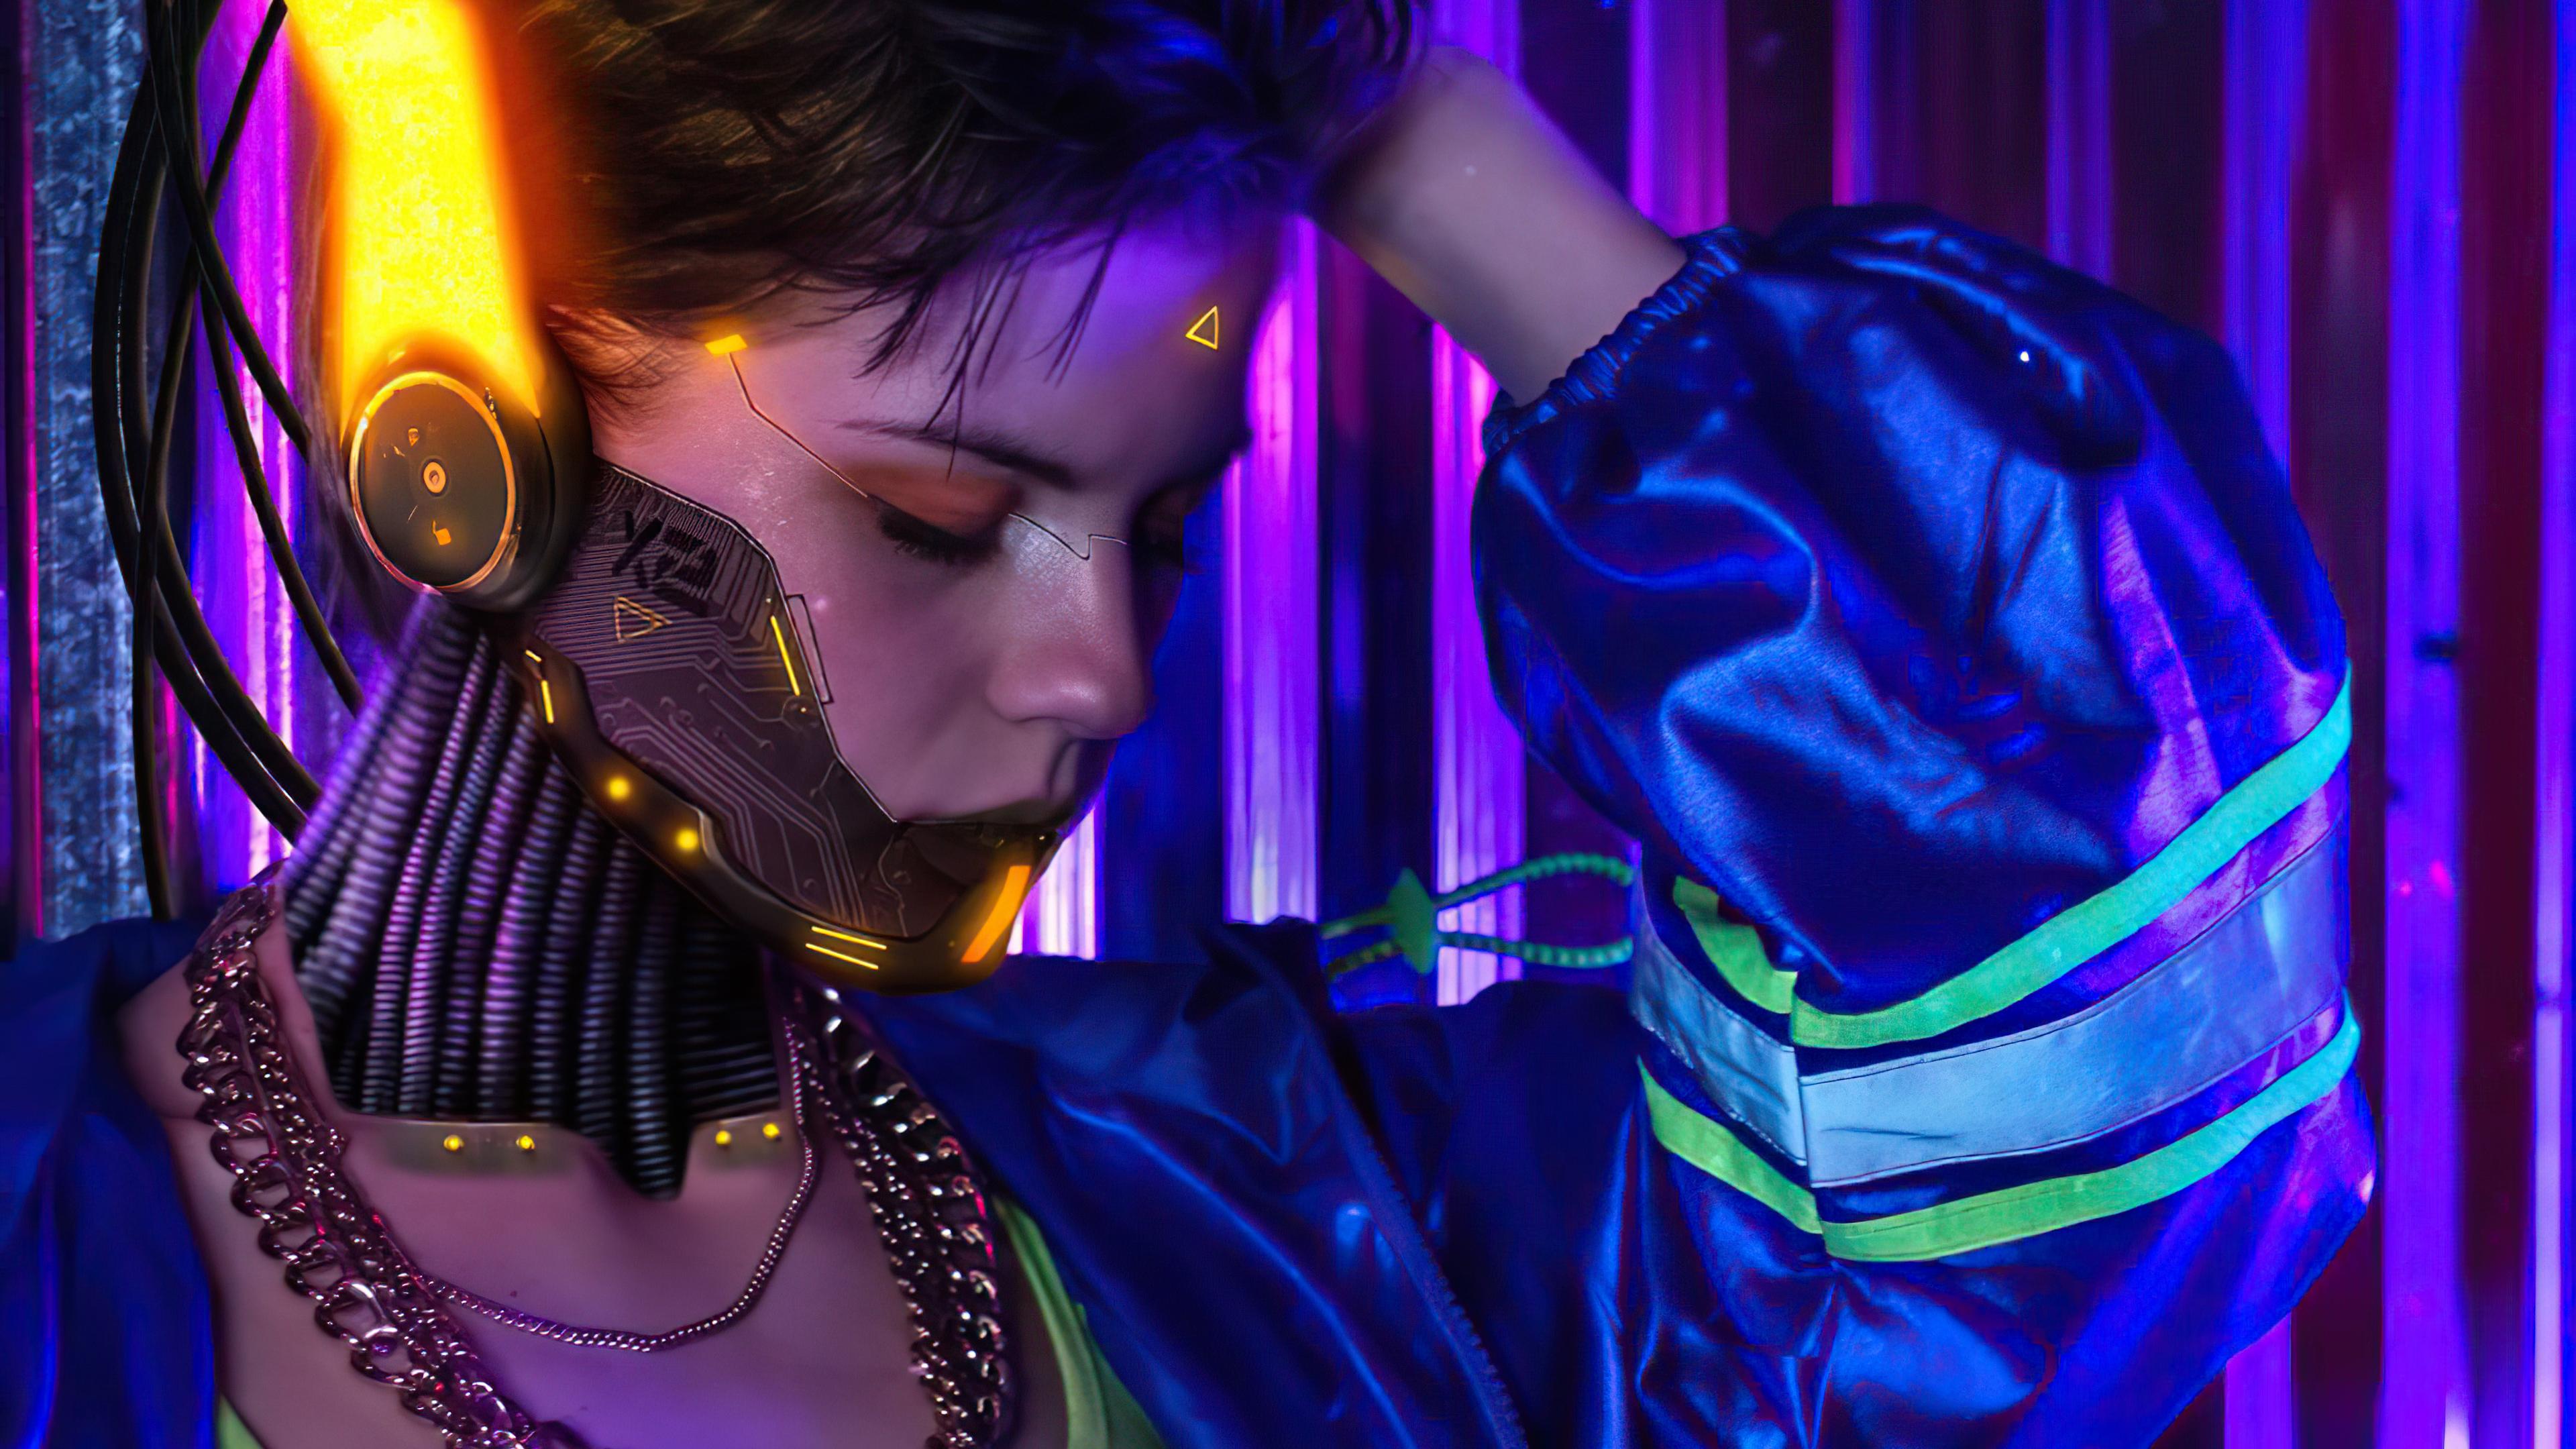 Cyberpunk 2077 Cosplay Girl 4k, HD Games, 4k Wallpapers ...